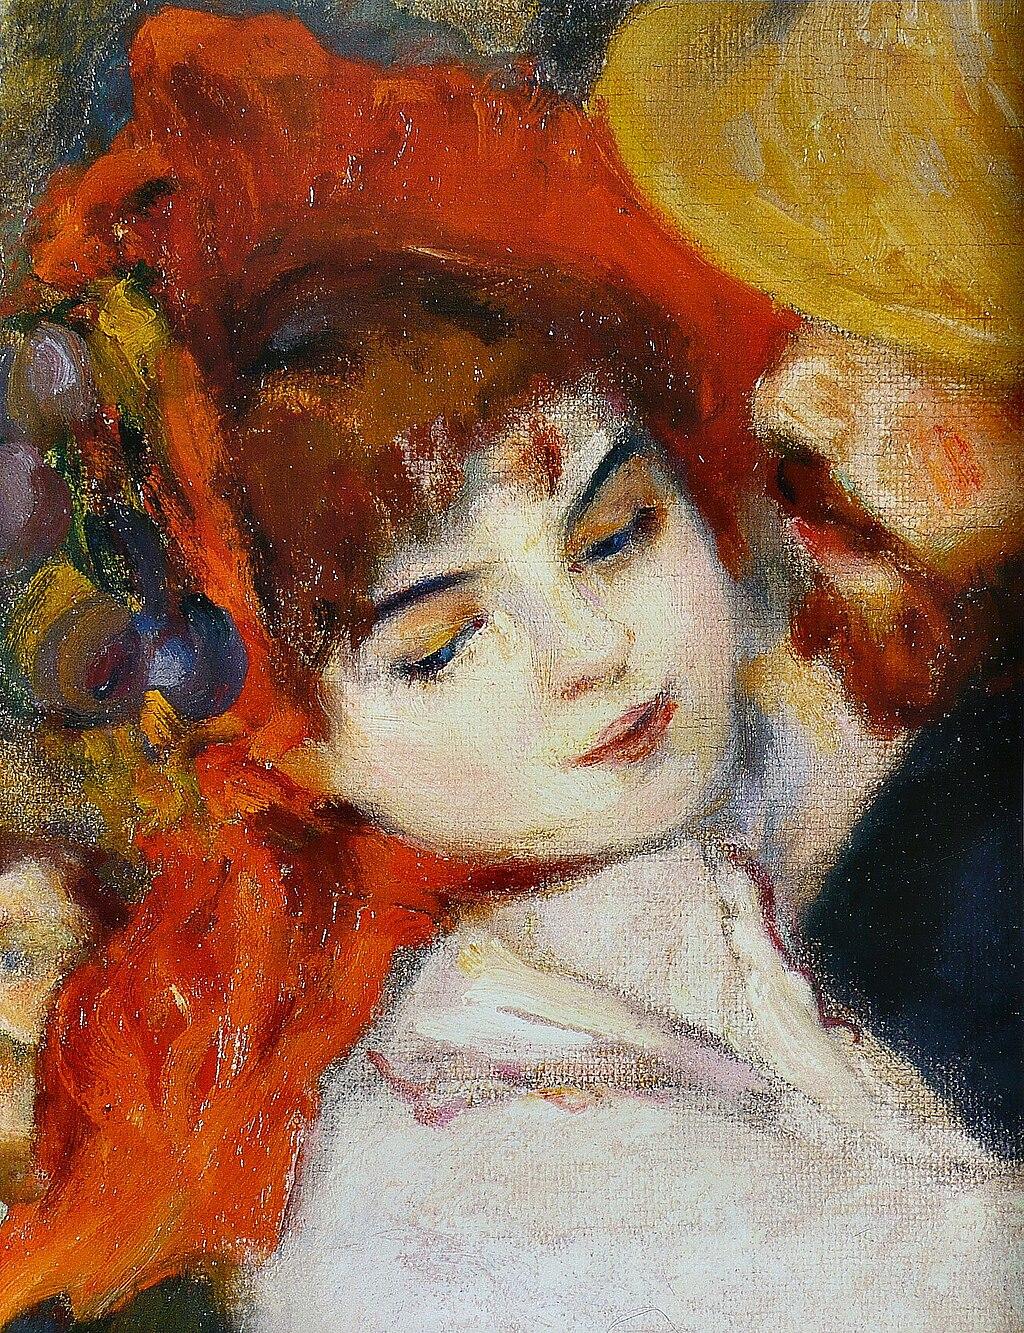 Pierre-Auguste Renoir - Suzanne Valadon - Dance at Bougival - Detail